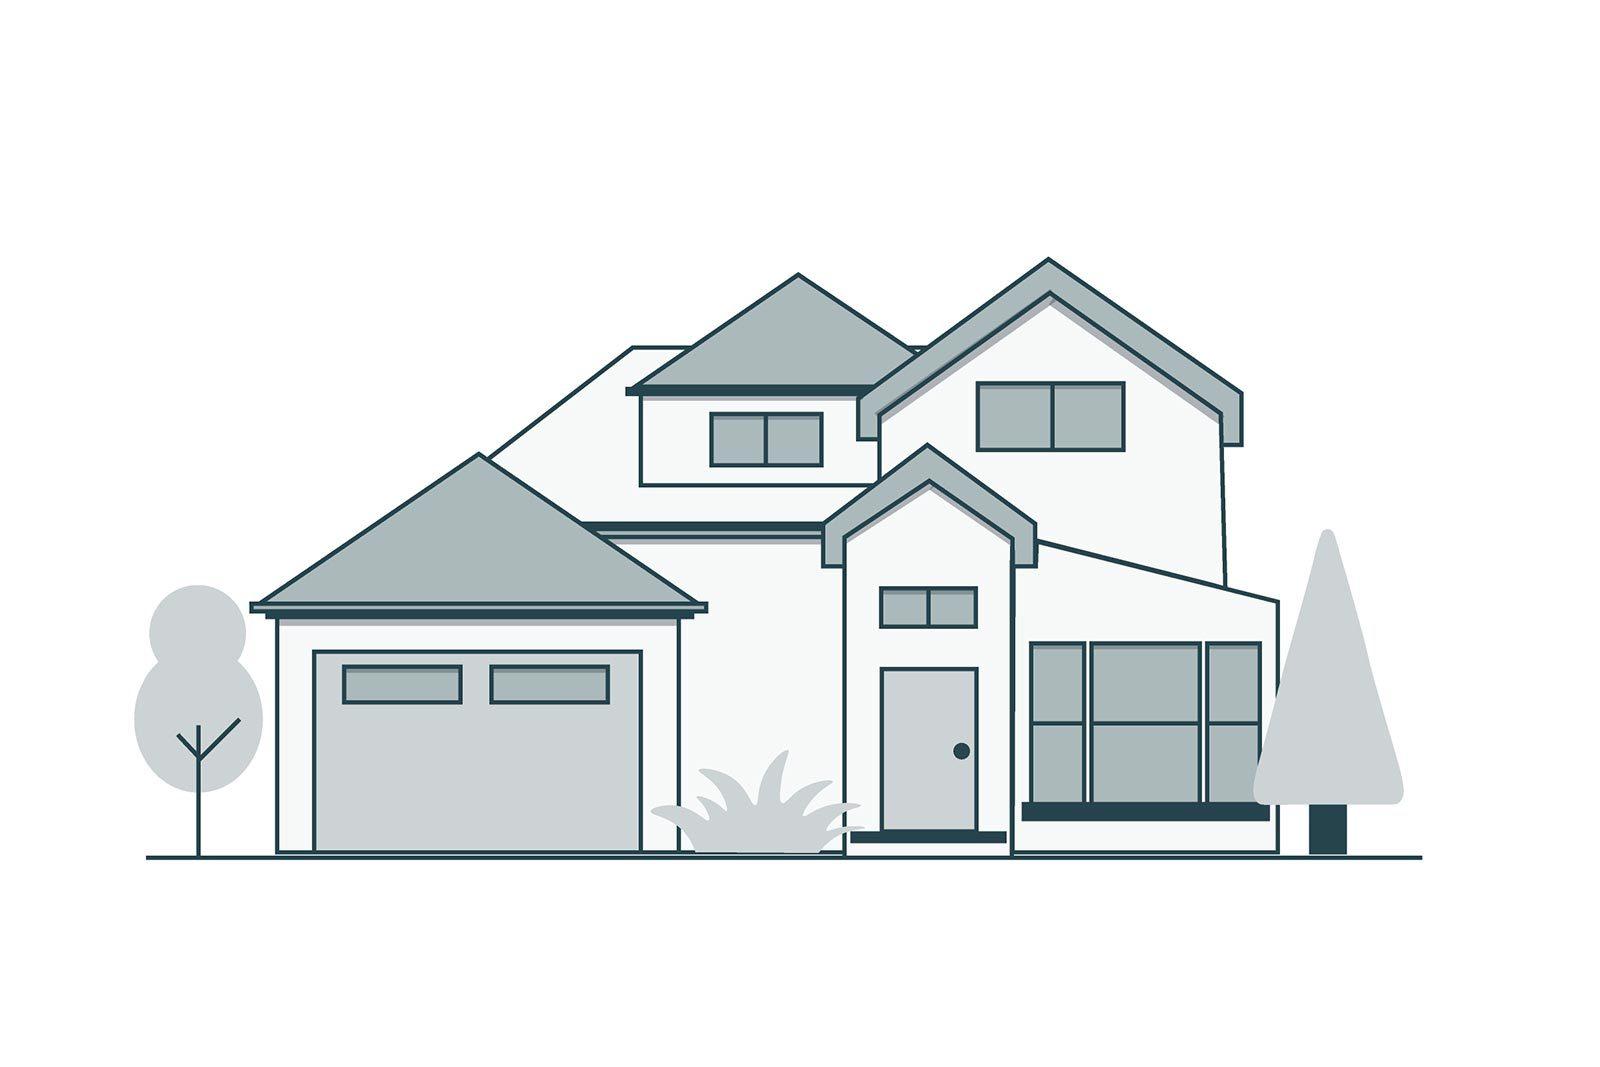 5695 Seifert Ave San Jose, CA 95118